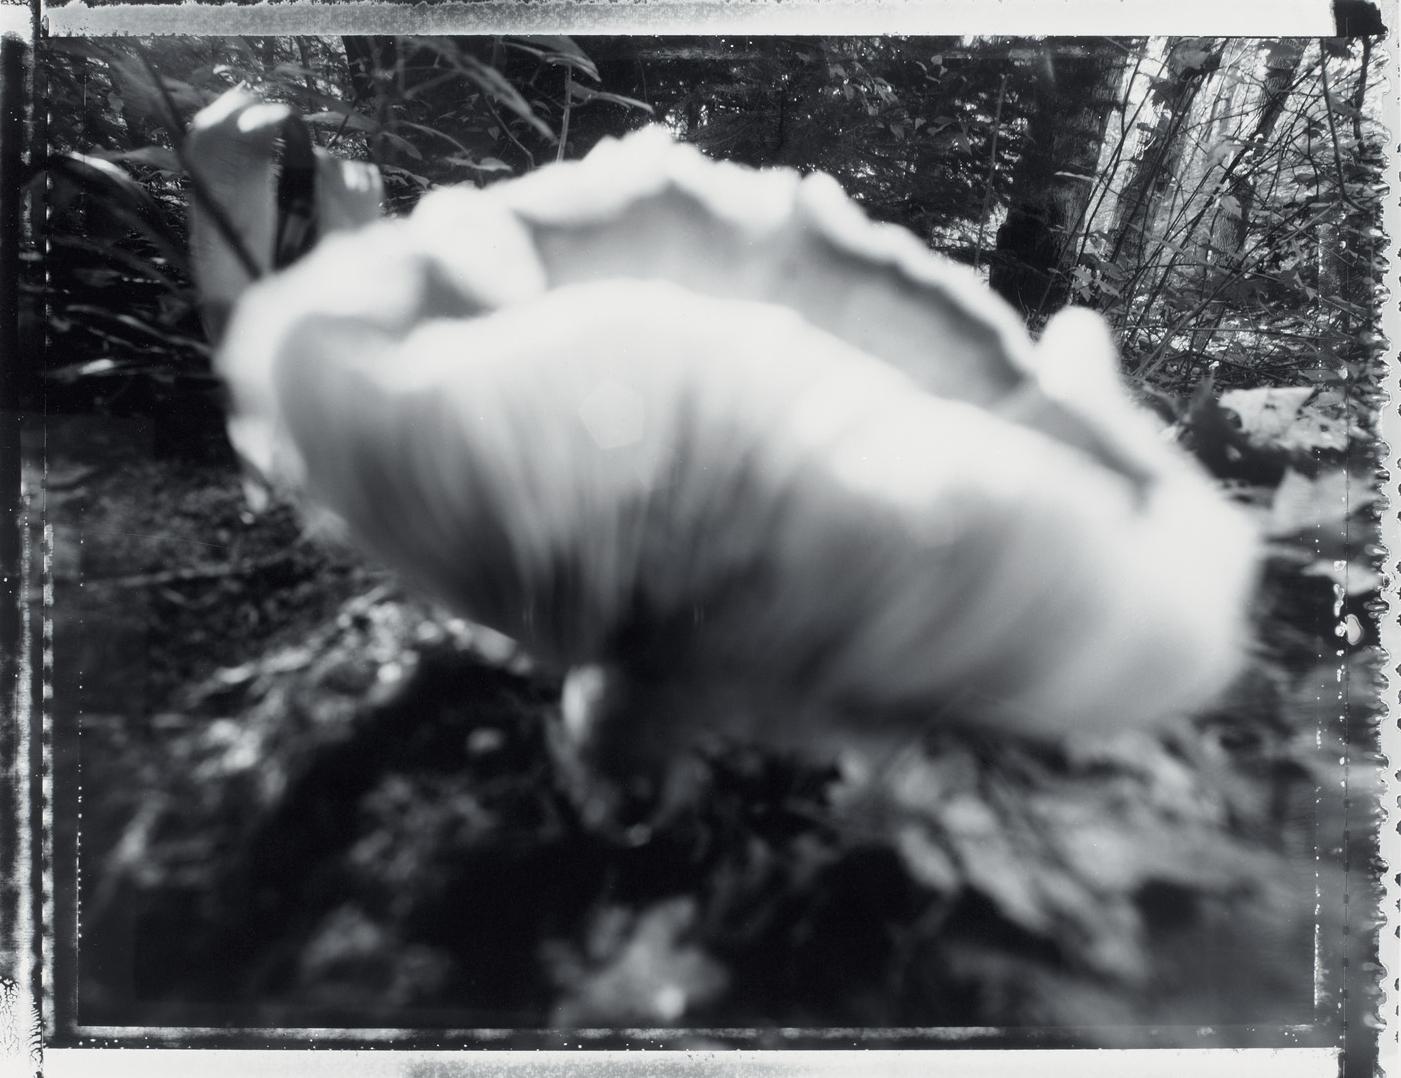 Coloma to Covert: Fleshy Fungi